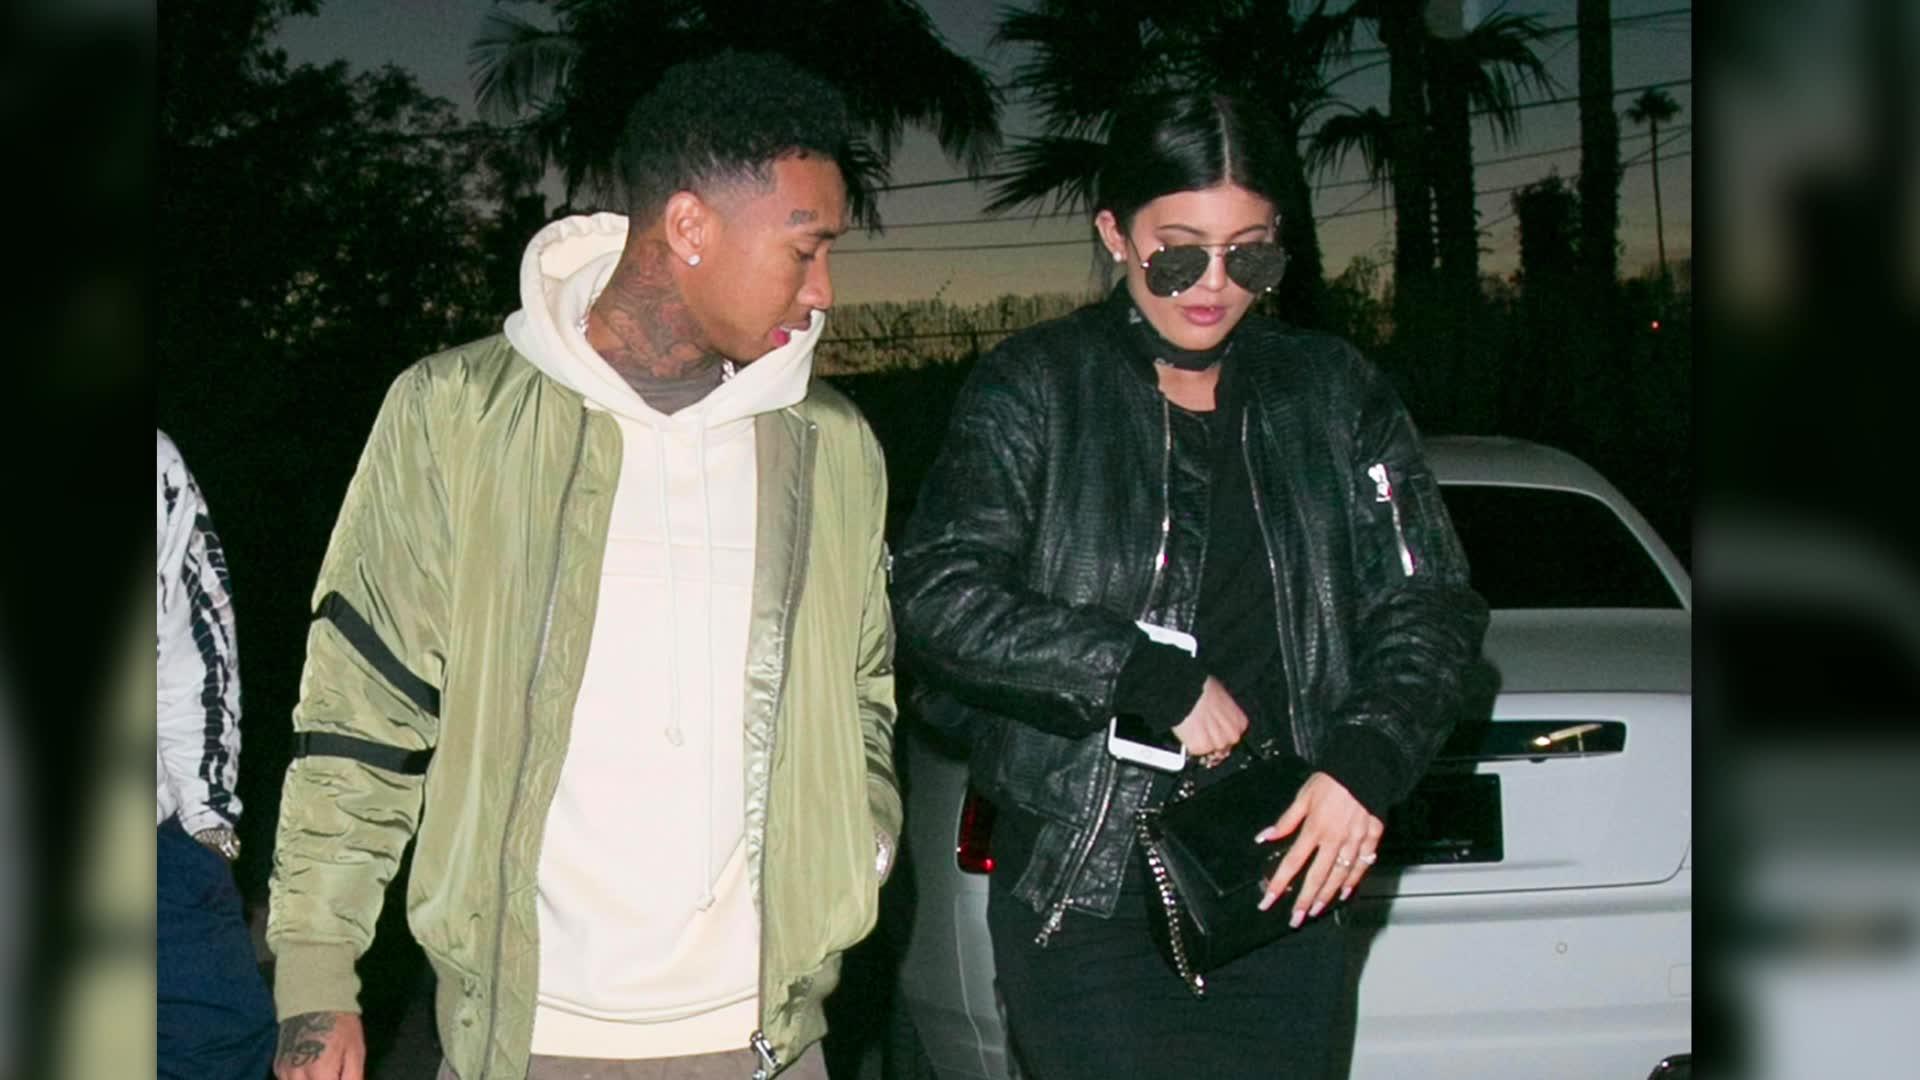 BREAKING! Kylie Jenner and Tyga BREAK UP!